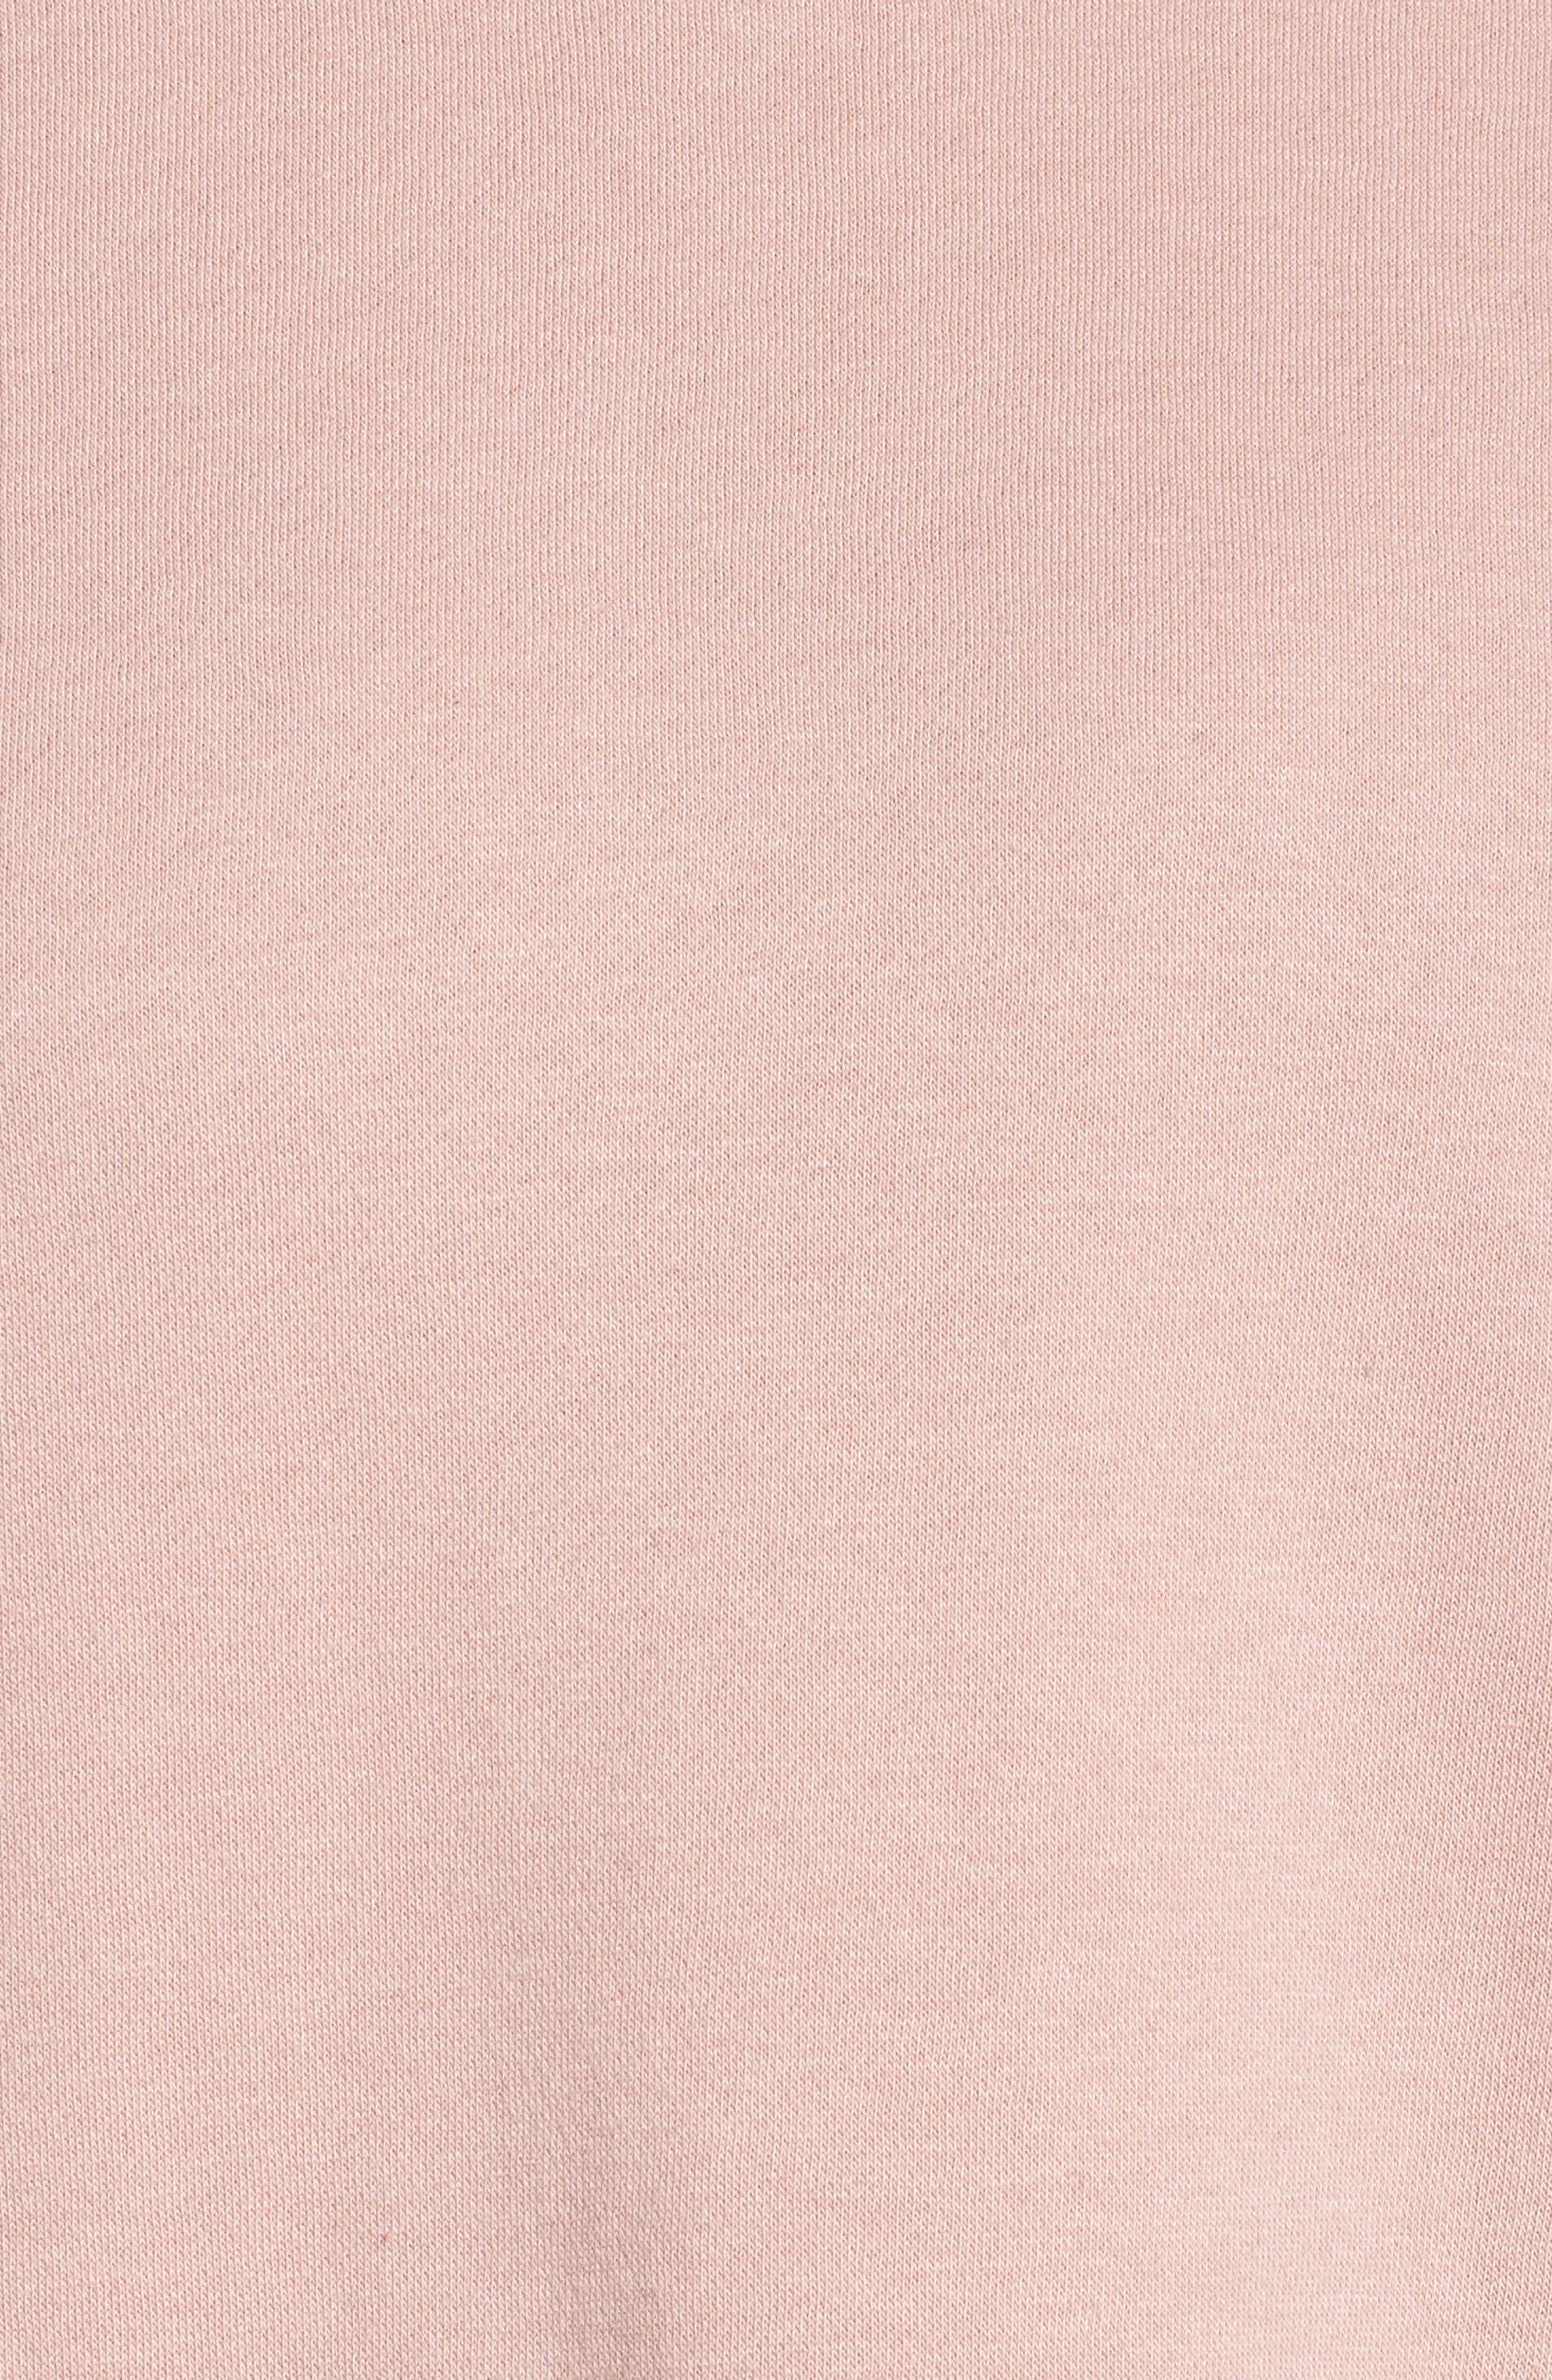 Cutout Sweatshirt,                             Alternate thumbnail 5, color,                             Rose Quartz